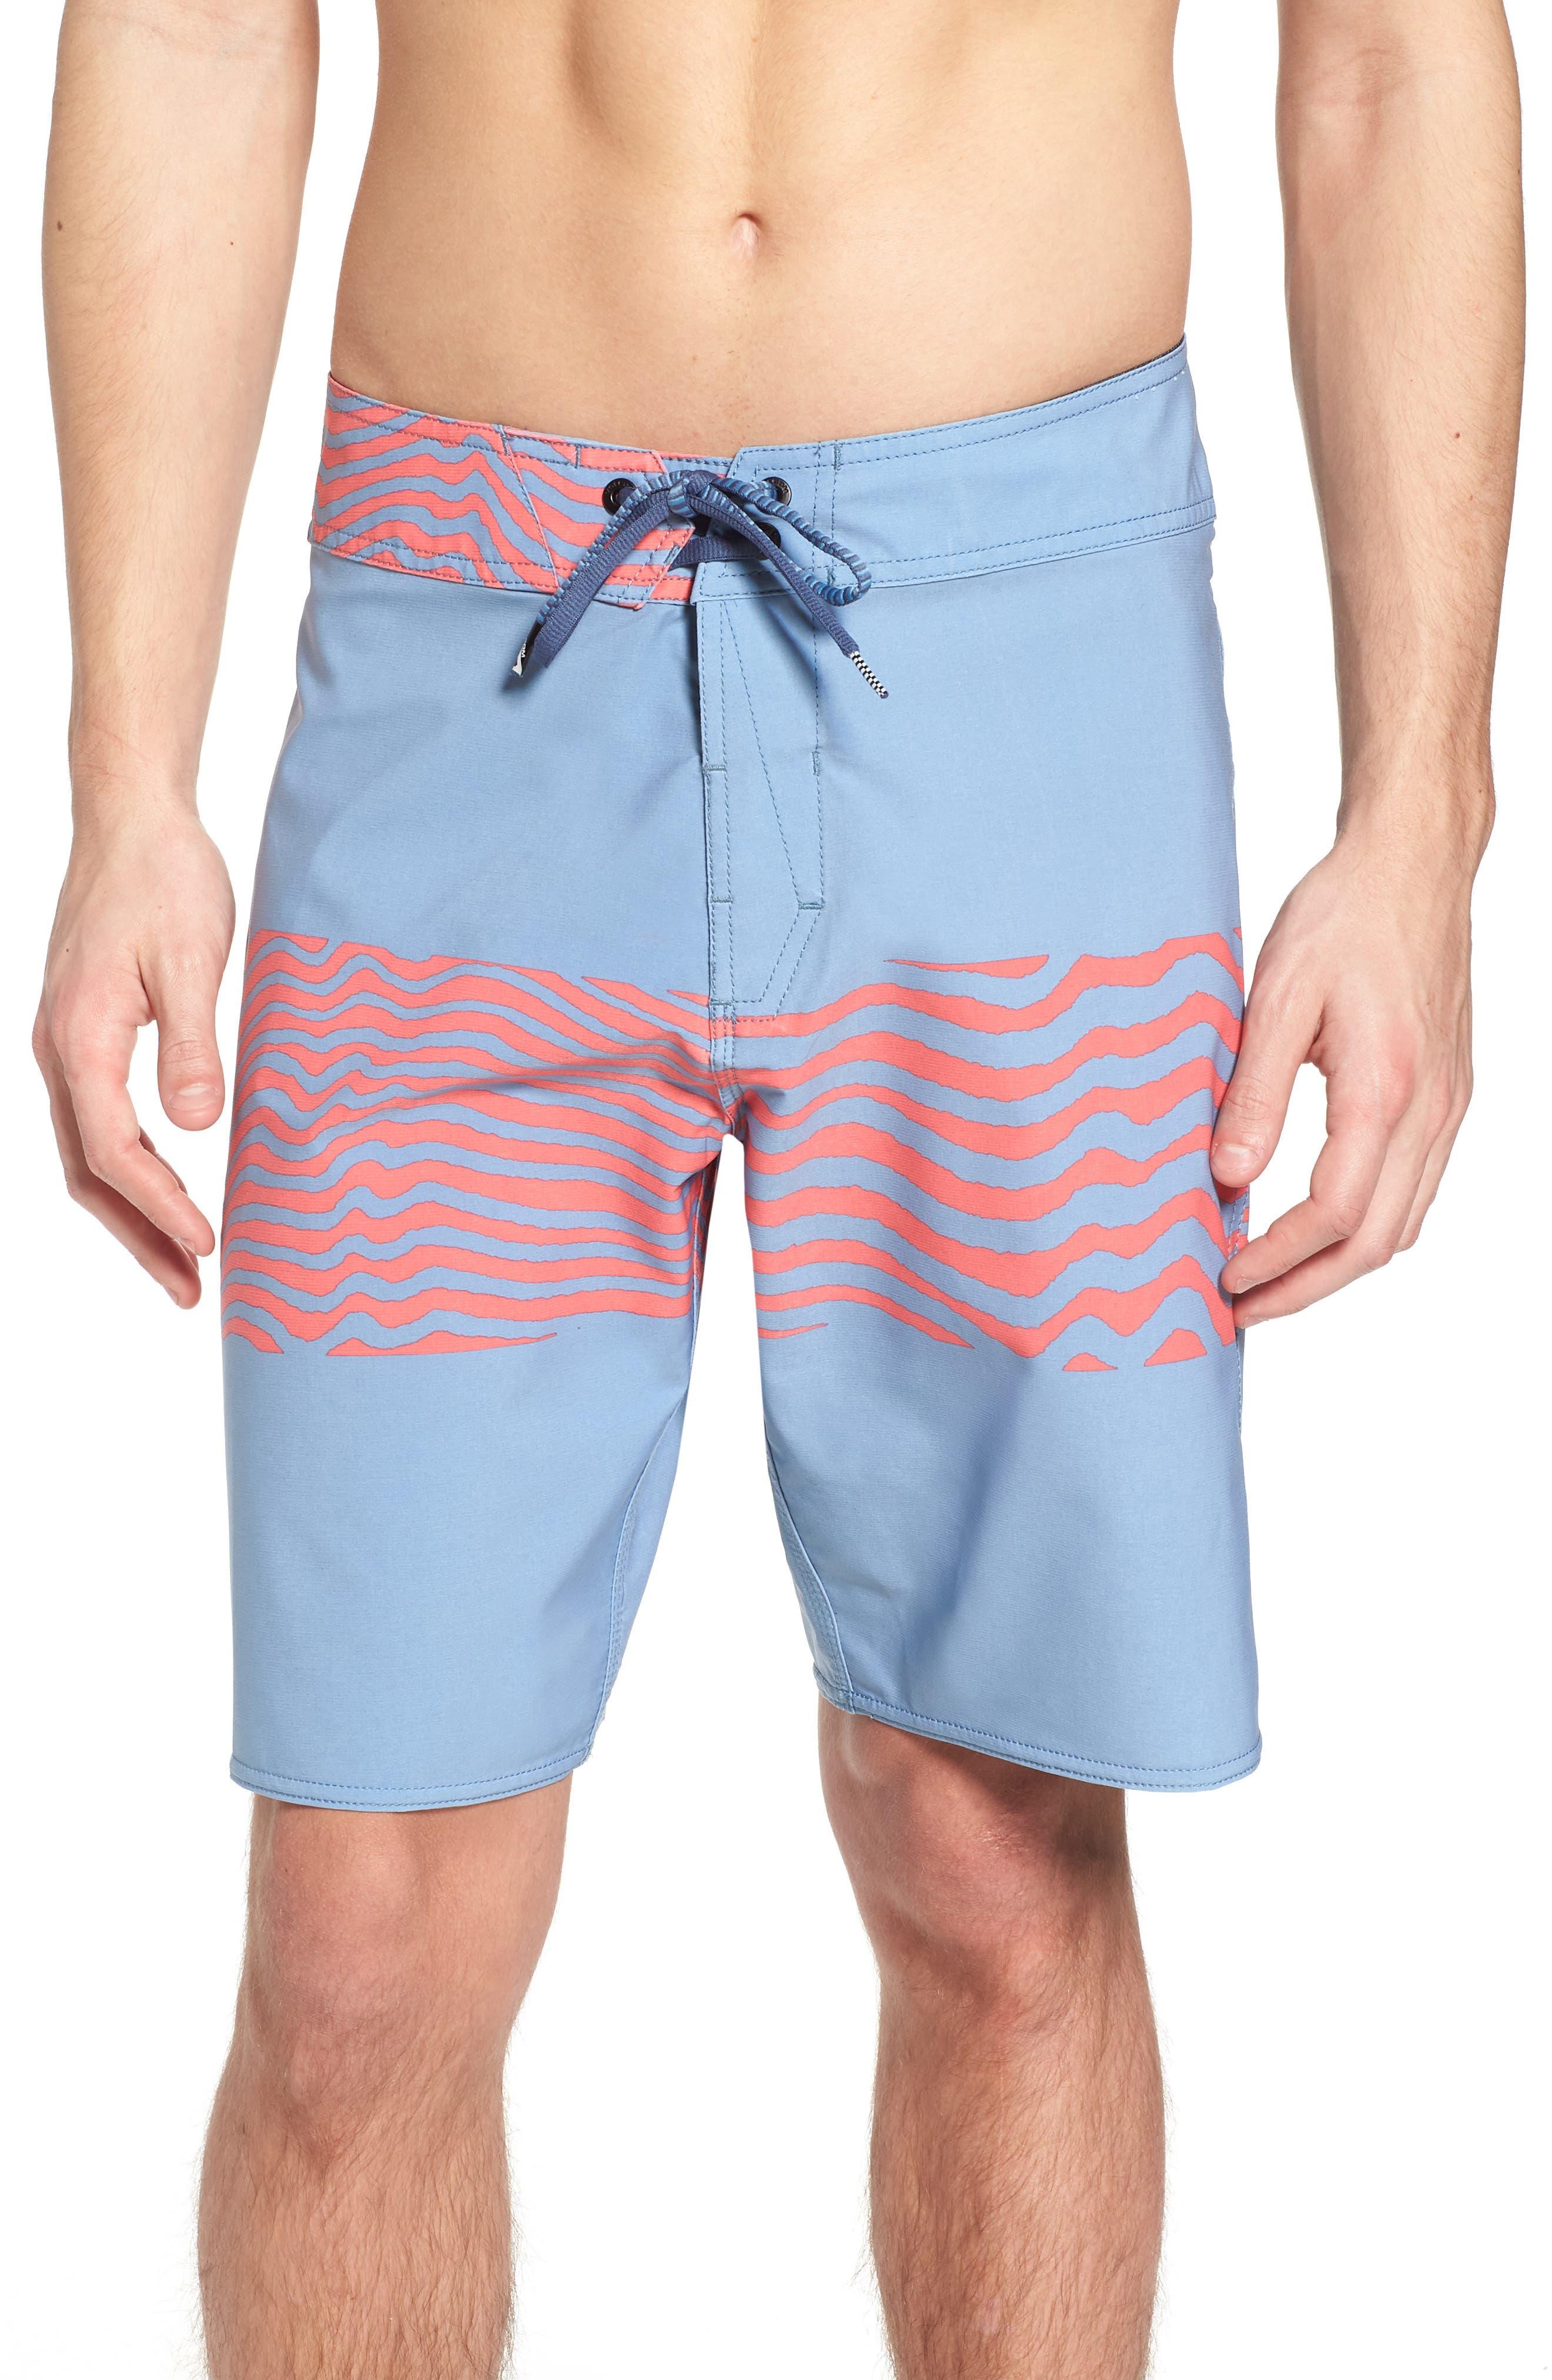 Macaw Faded Mod Board Shorts,                             Main thumbnail 1, color,                             499